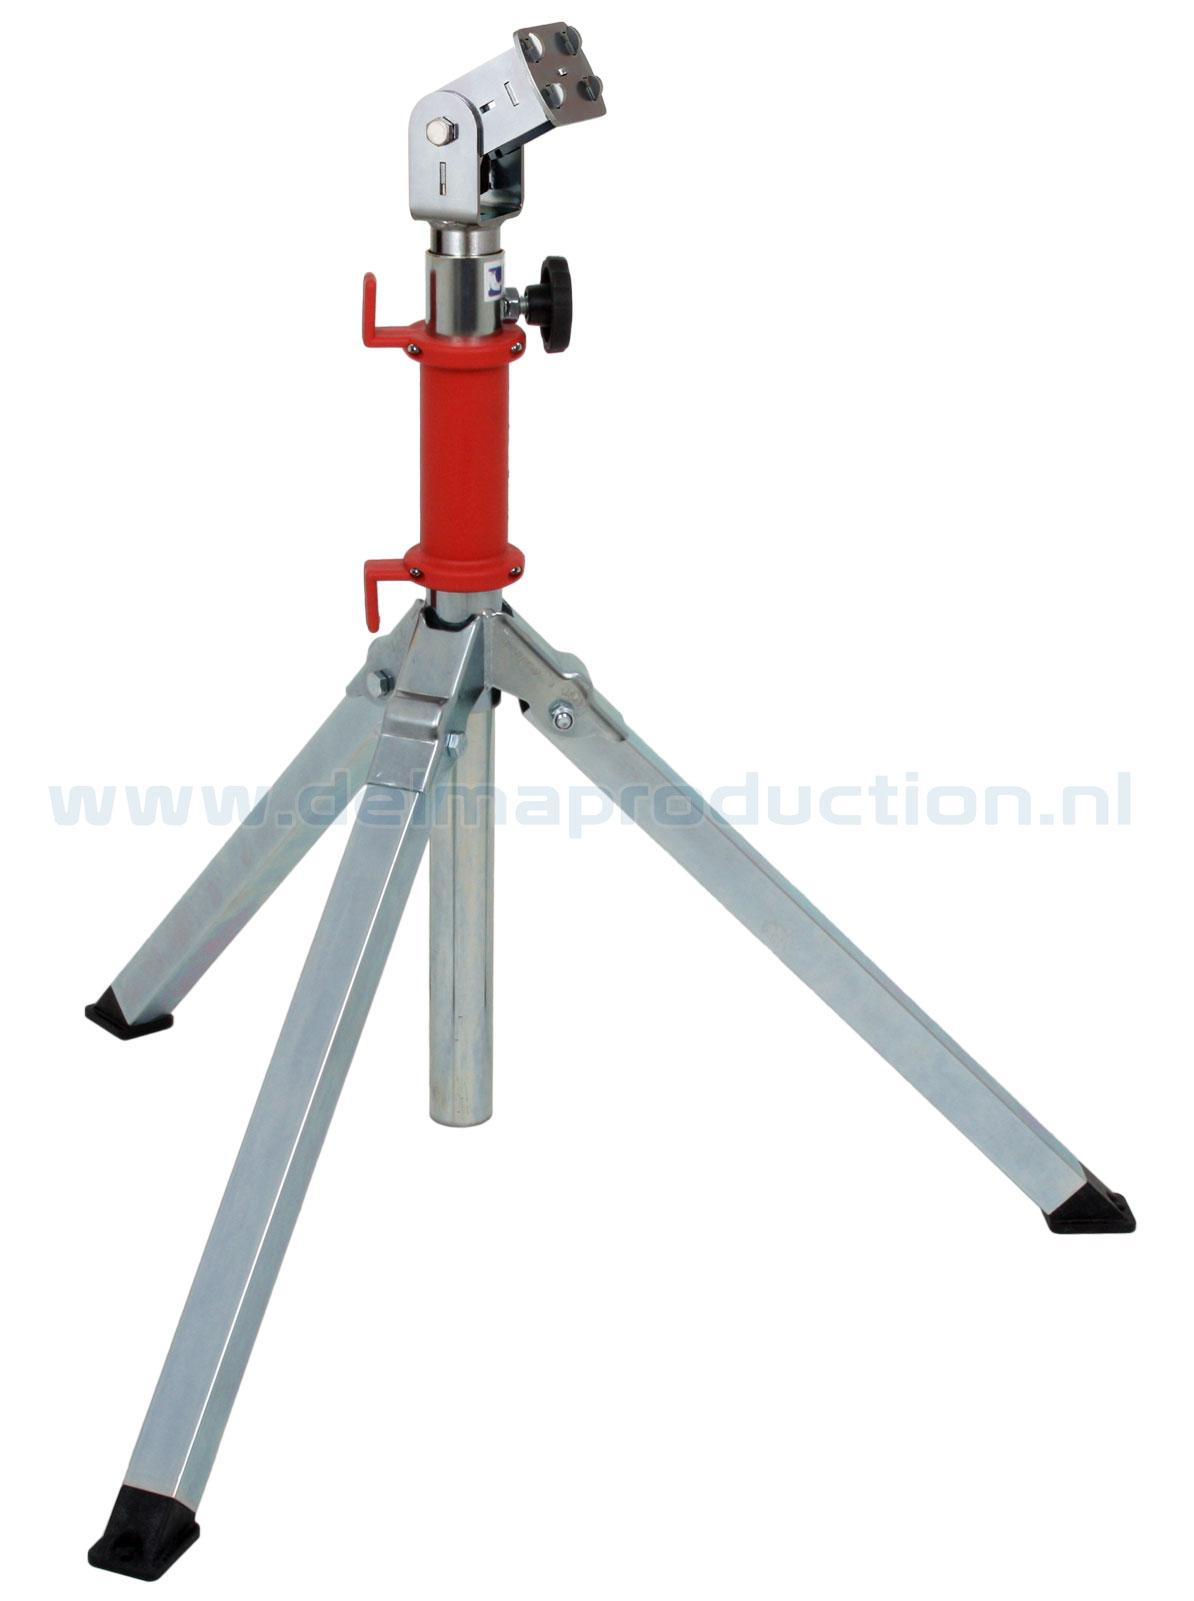 Bau-Teleskop-Stativ 2-teilig Midi, Quick Release System